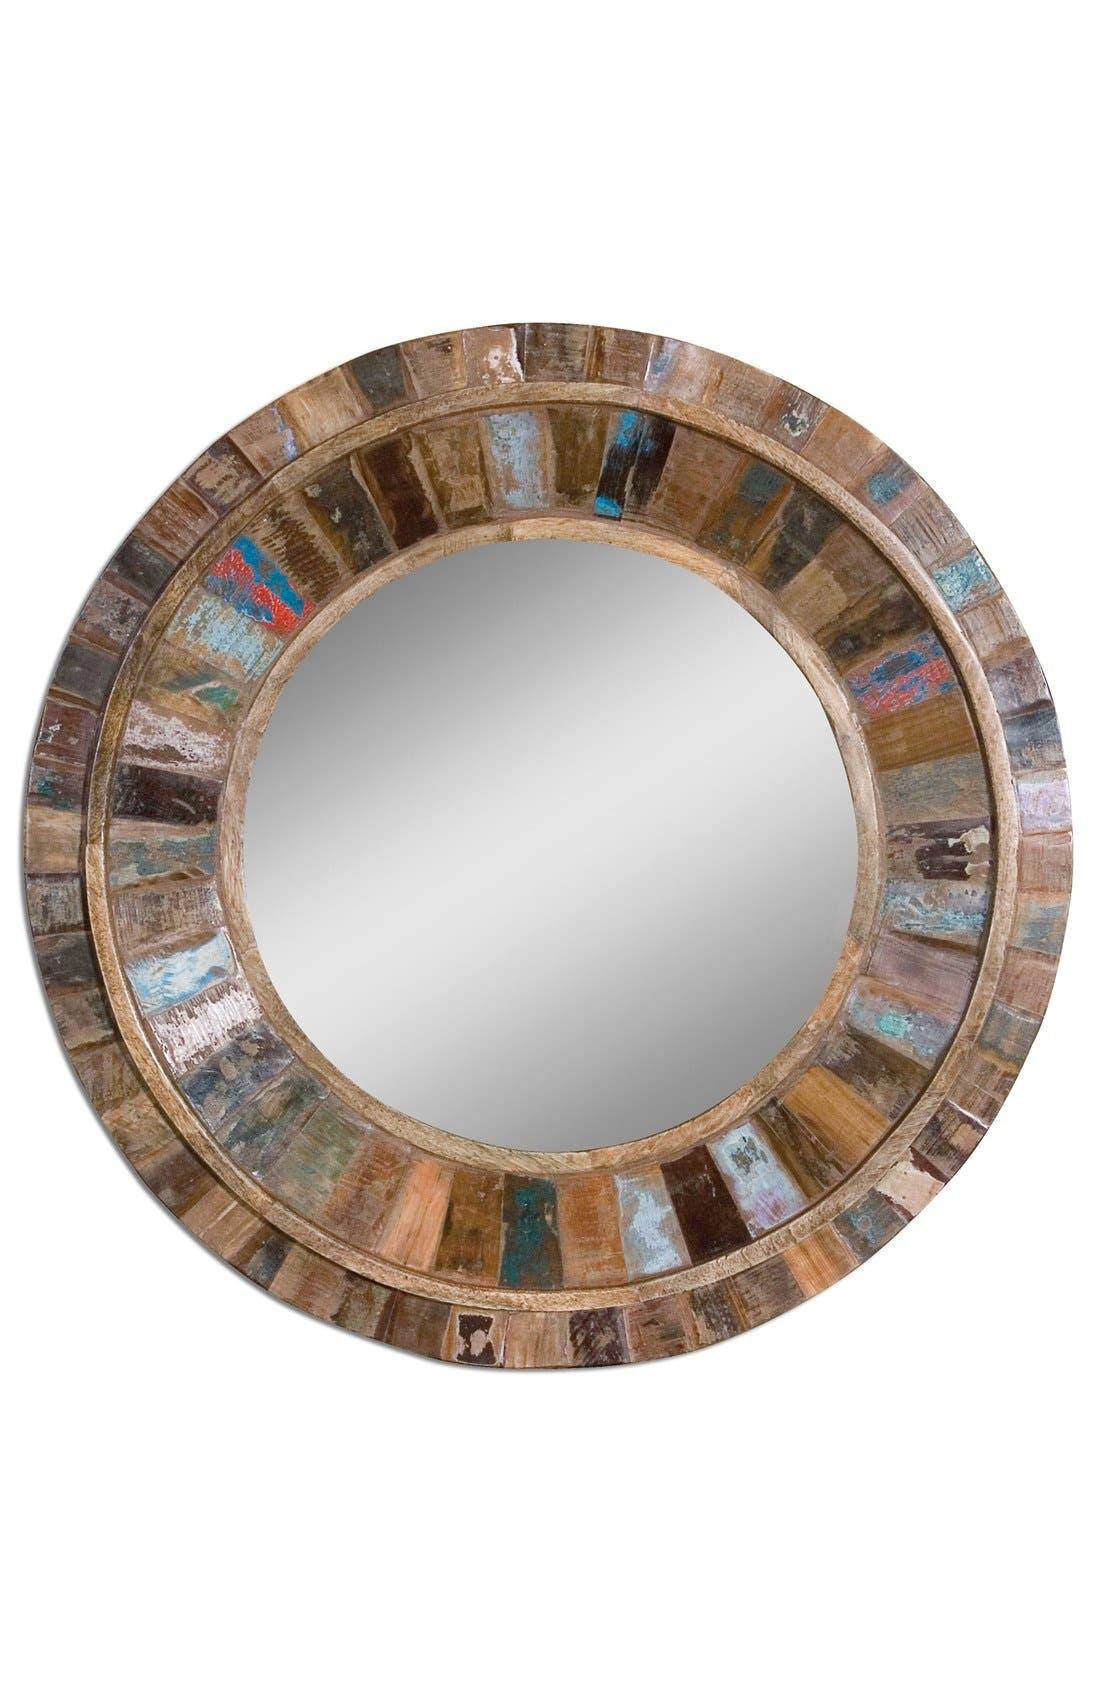 Uttermost 'Jeremiah' Round Wooden Wall Mirror